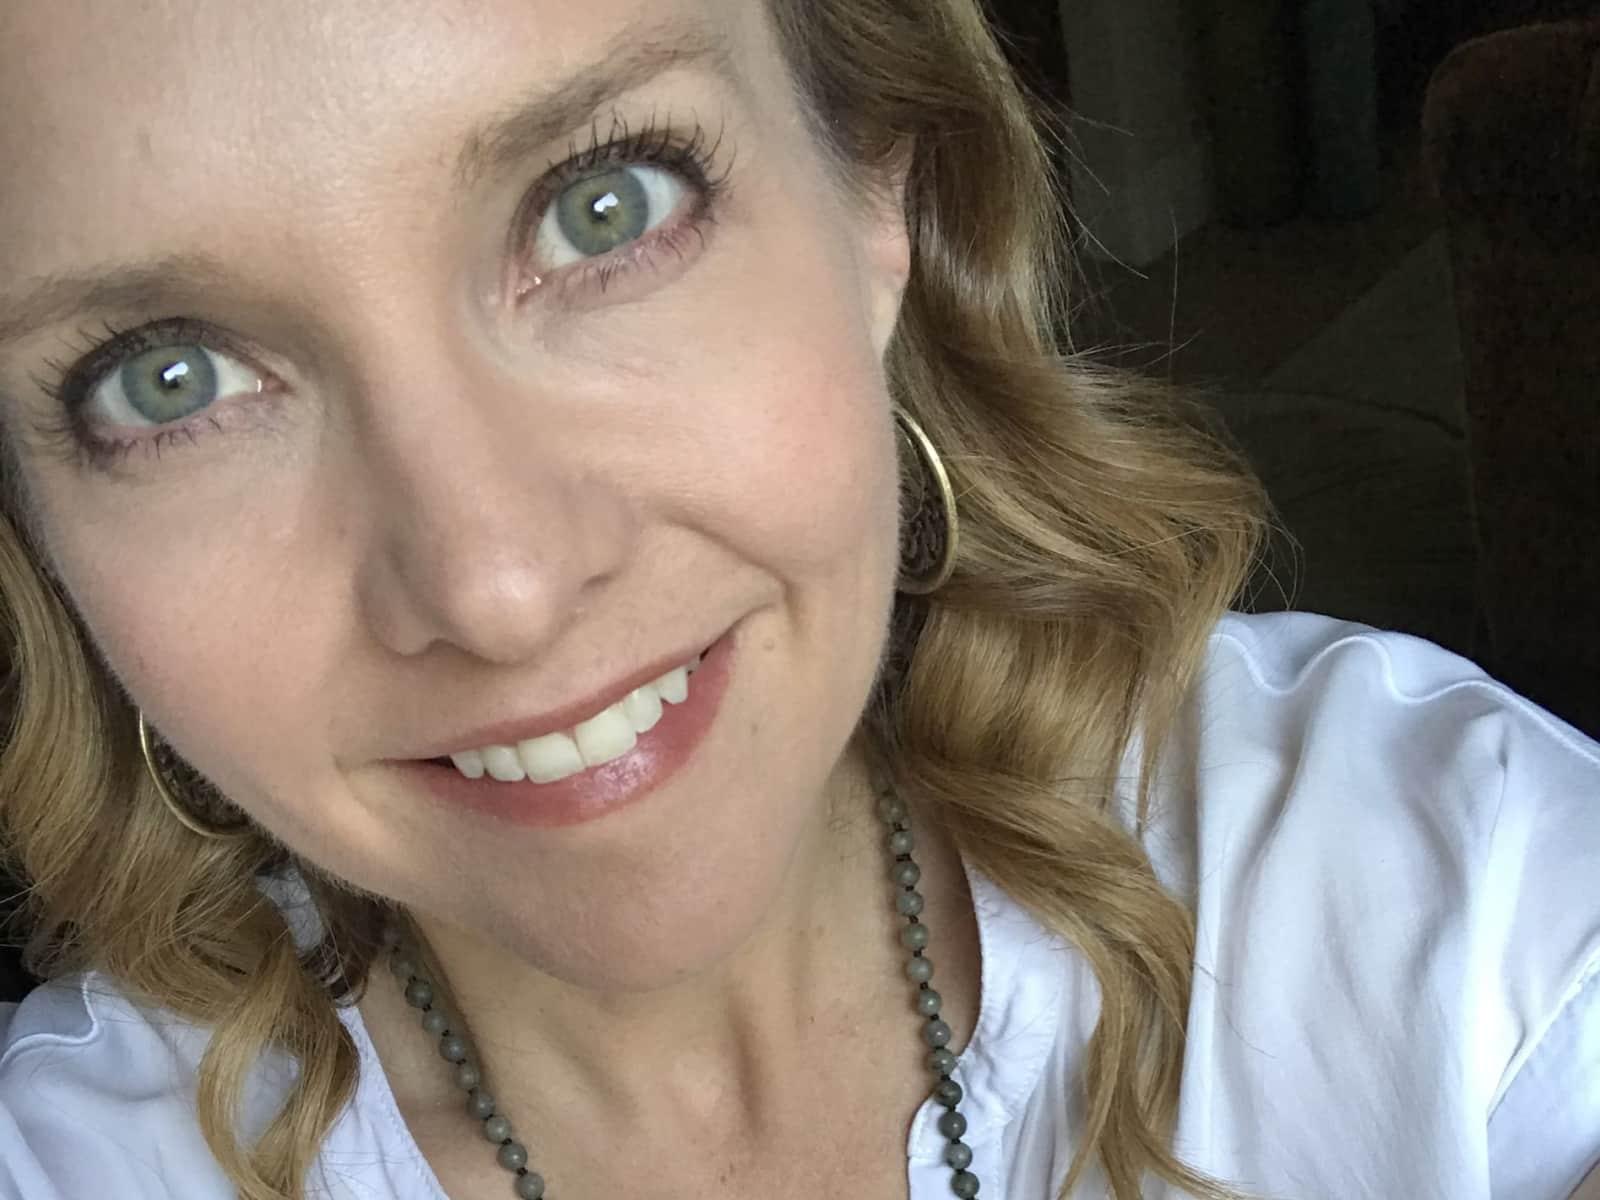 Lisa from Salt Lake City, Utah, United States